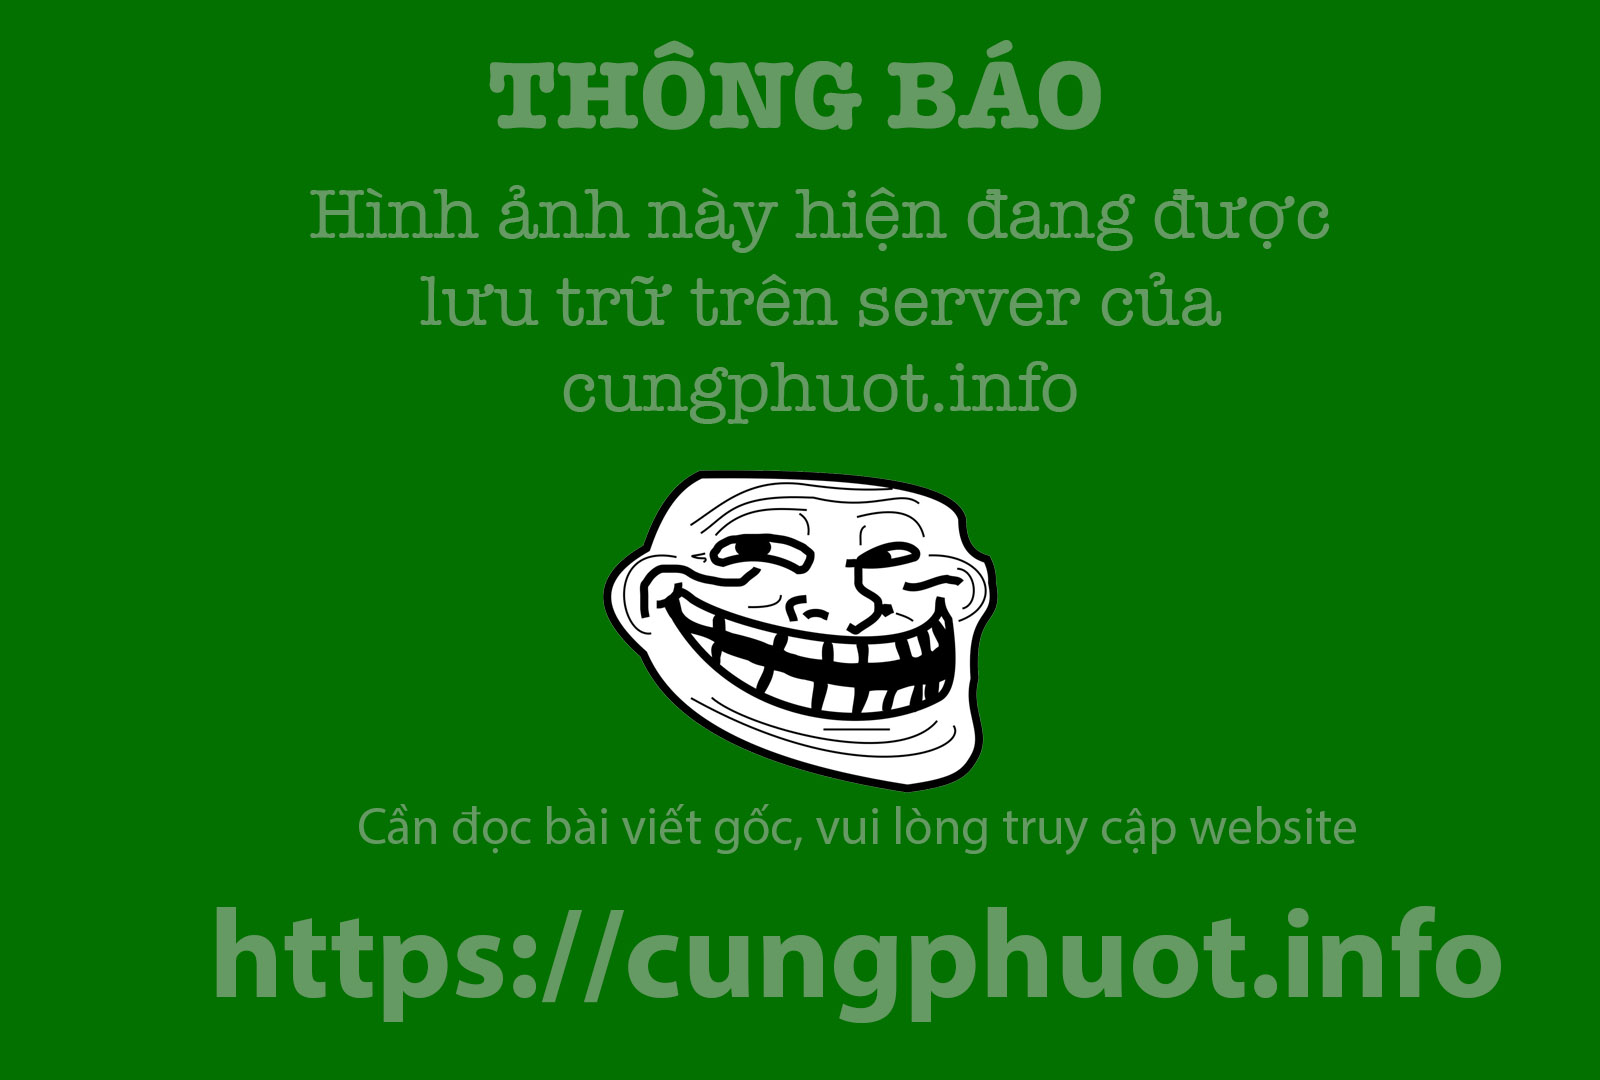 Chon bien cuong 'troi thap, dat cao' o Nam Can hinh anh 2